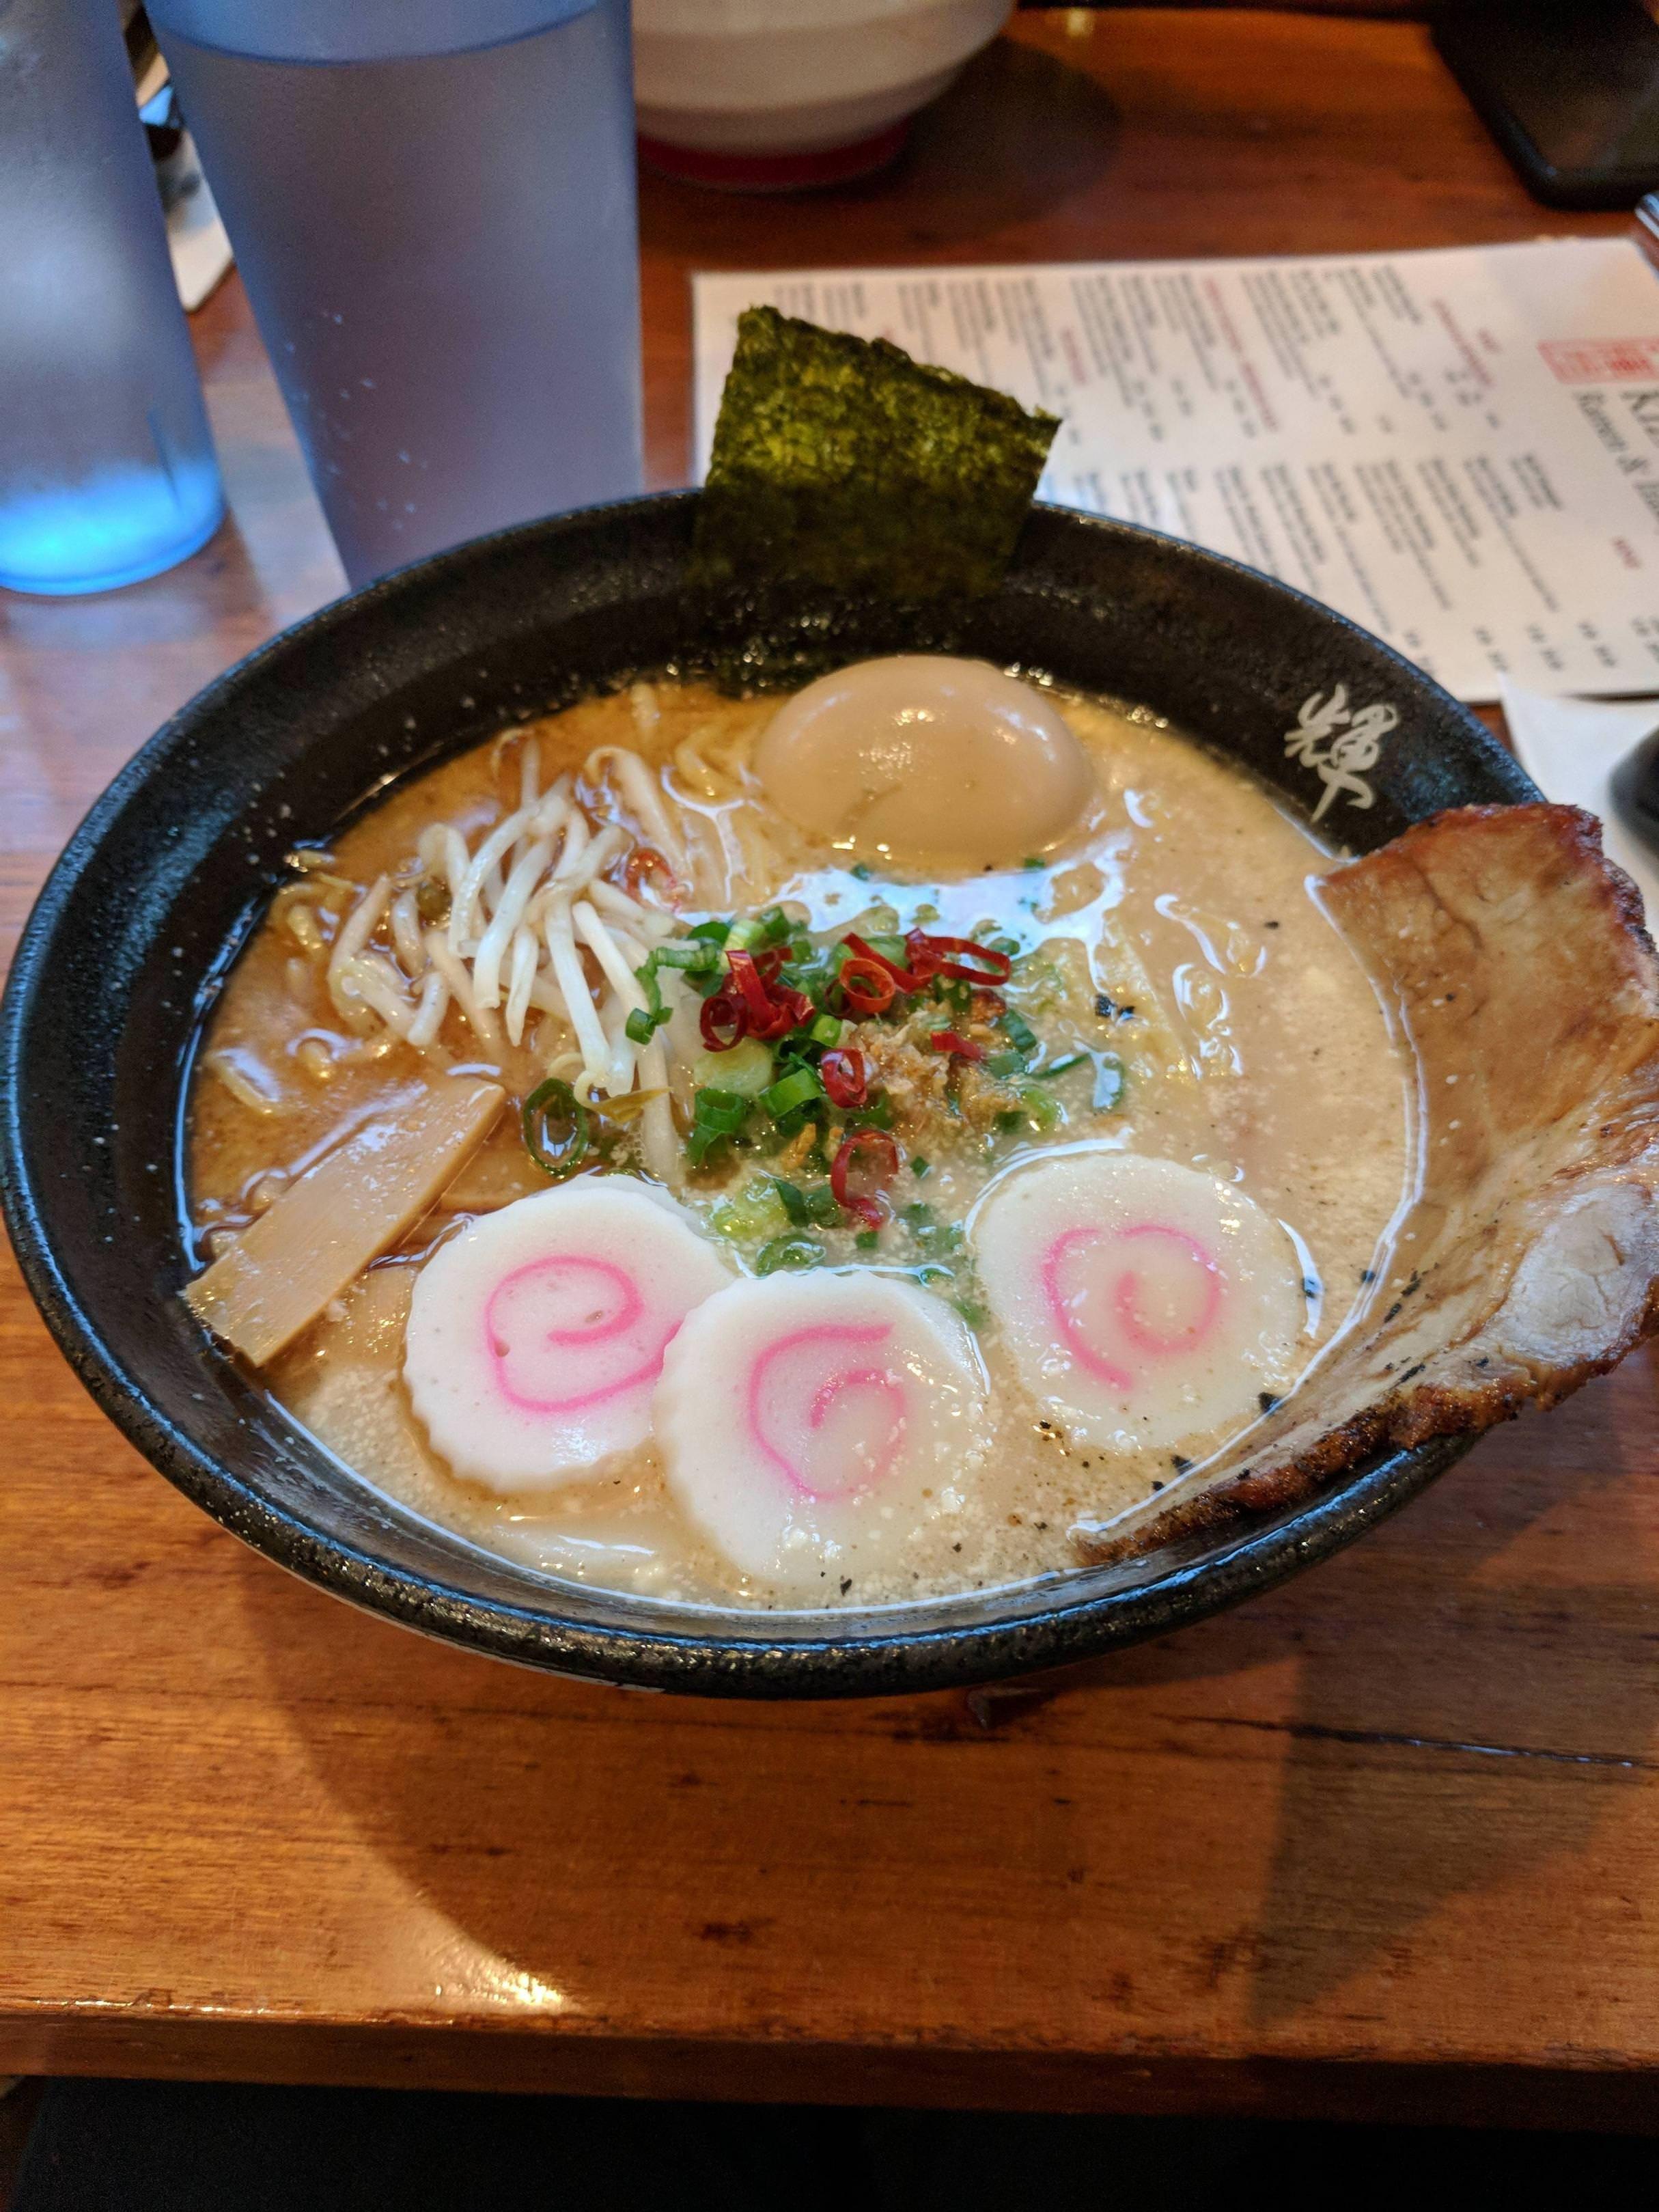 Ramen Noodles With Naruto I Ate Food Recipes Food Recipes